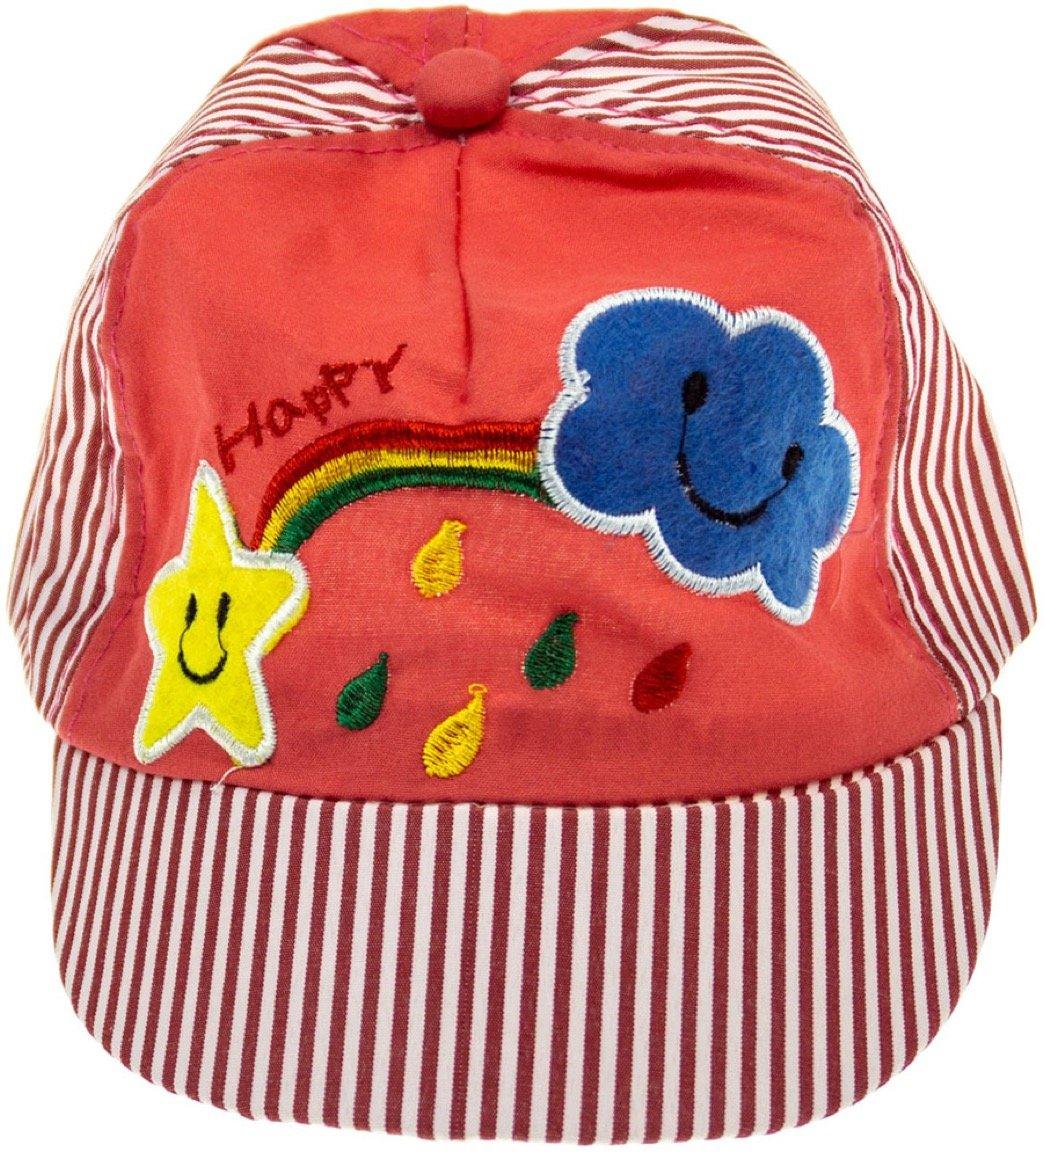 Georgia Accessories παιδικό καπέλο «Red Sky»